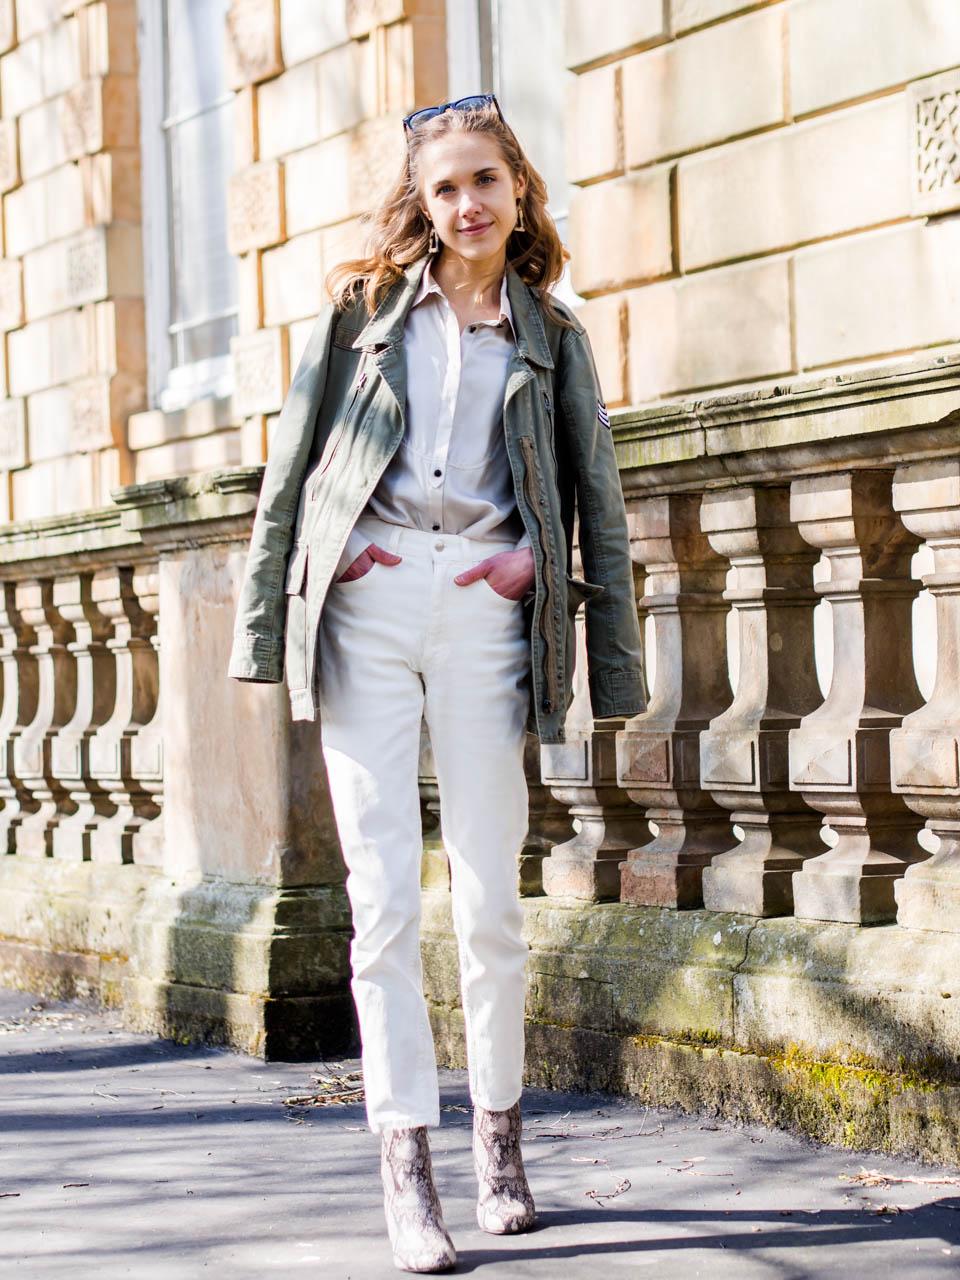 spring-fashion-trends-2019-utility-cargo-jacket-white-mom-jeans